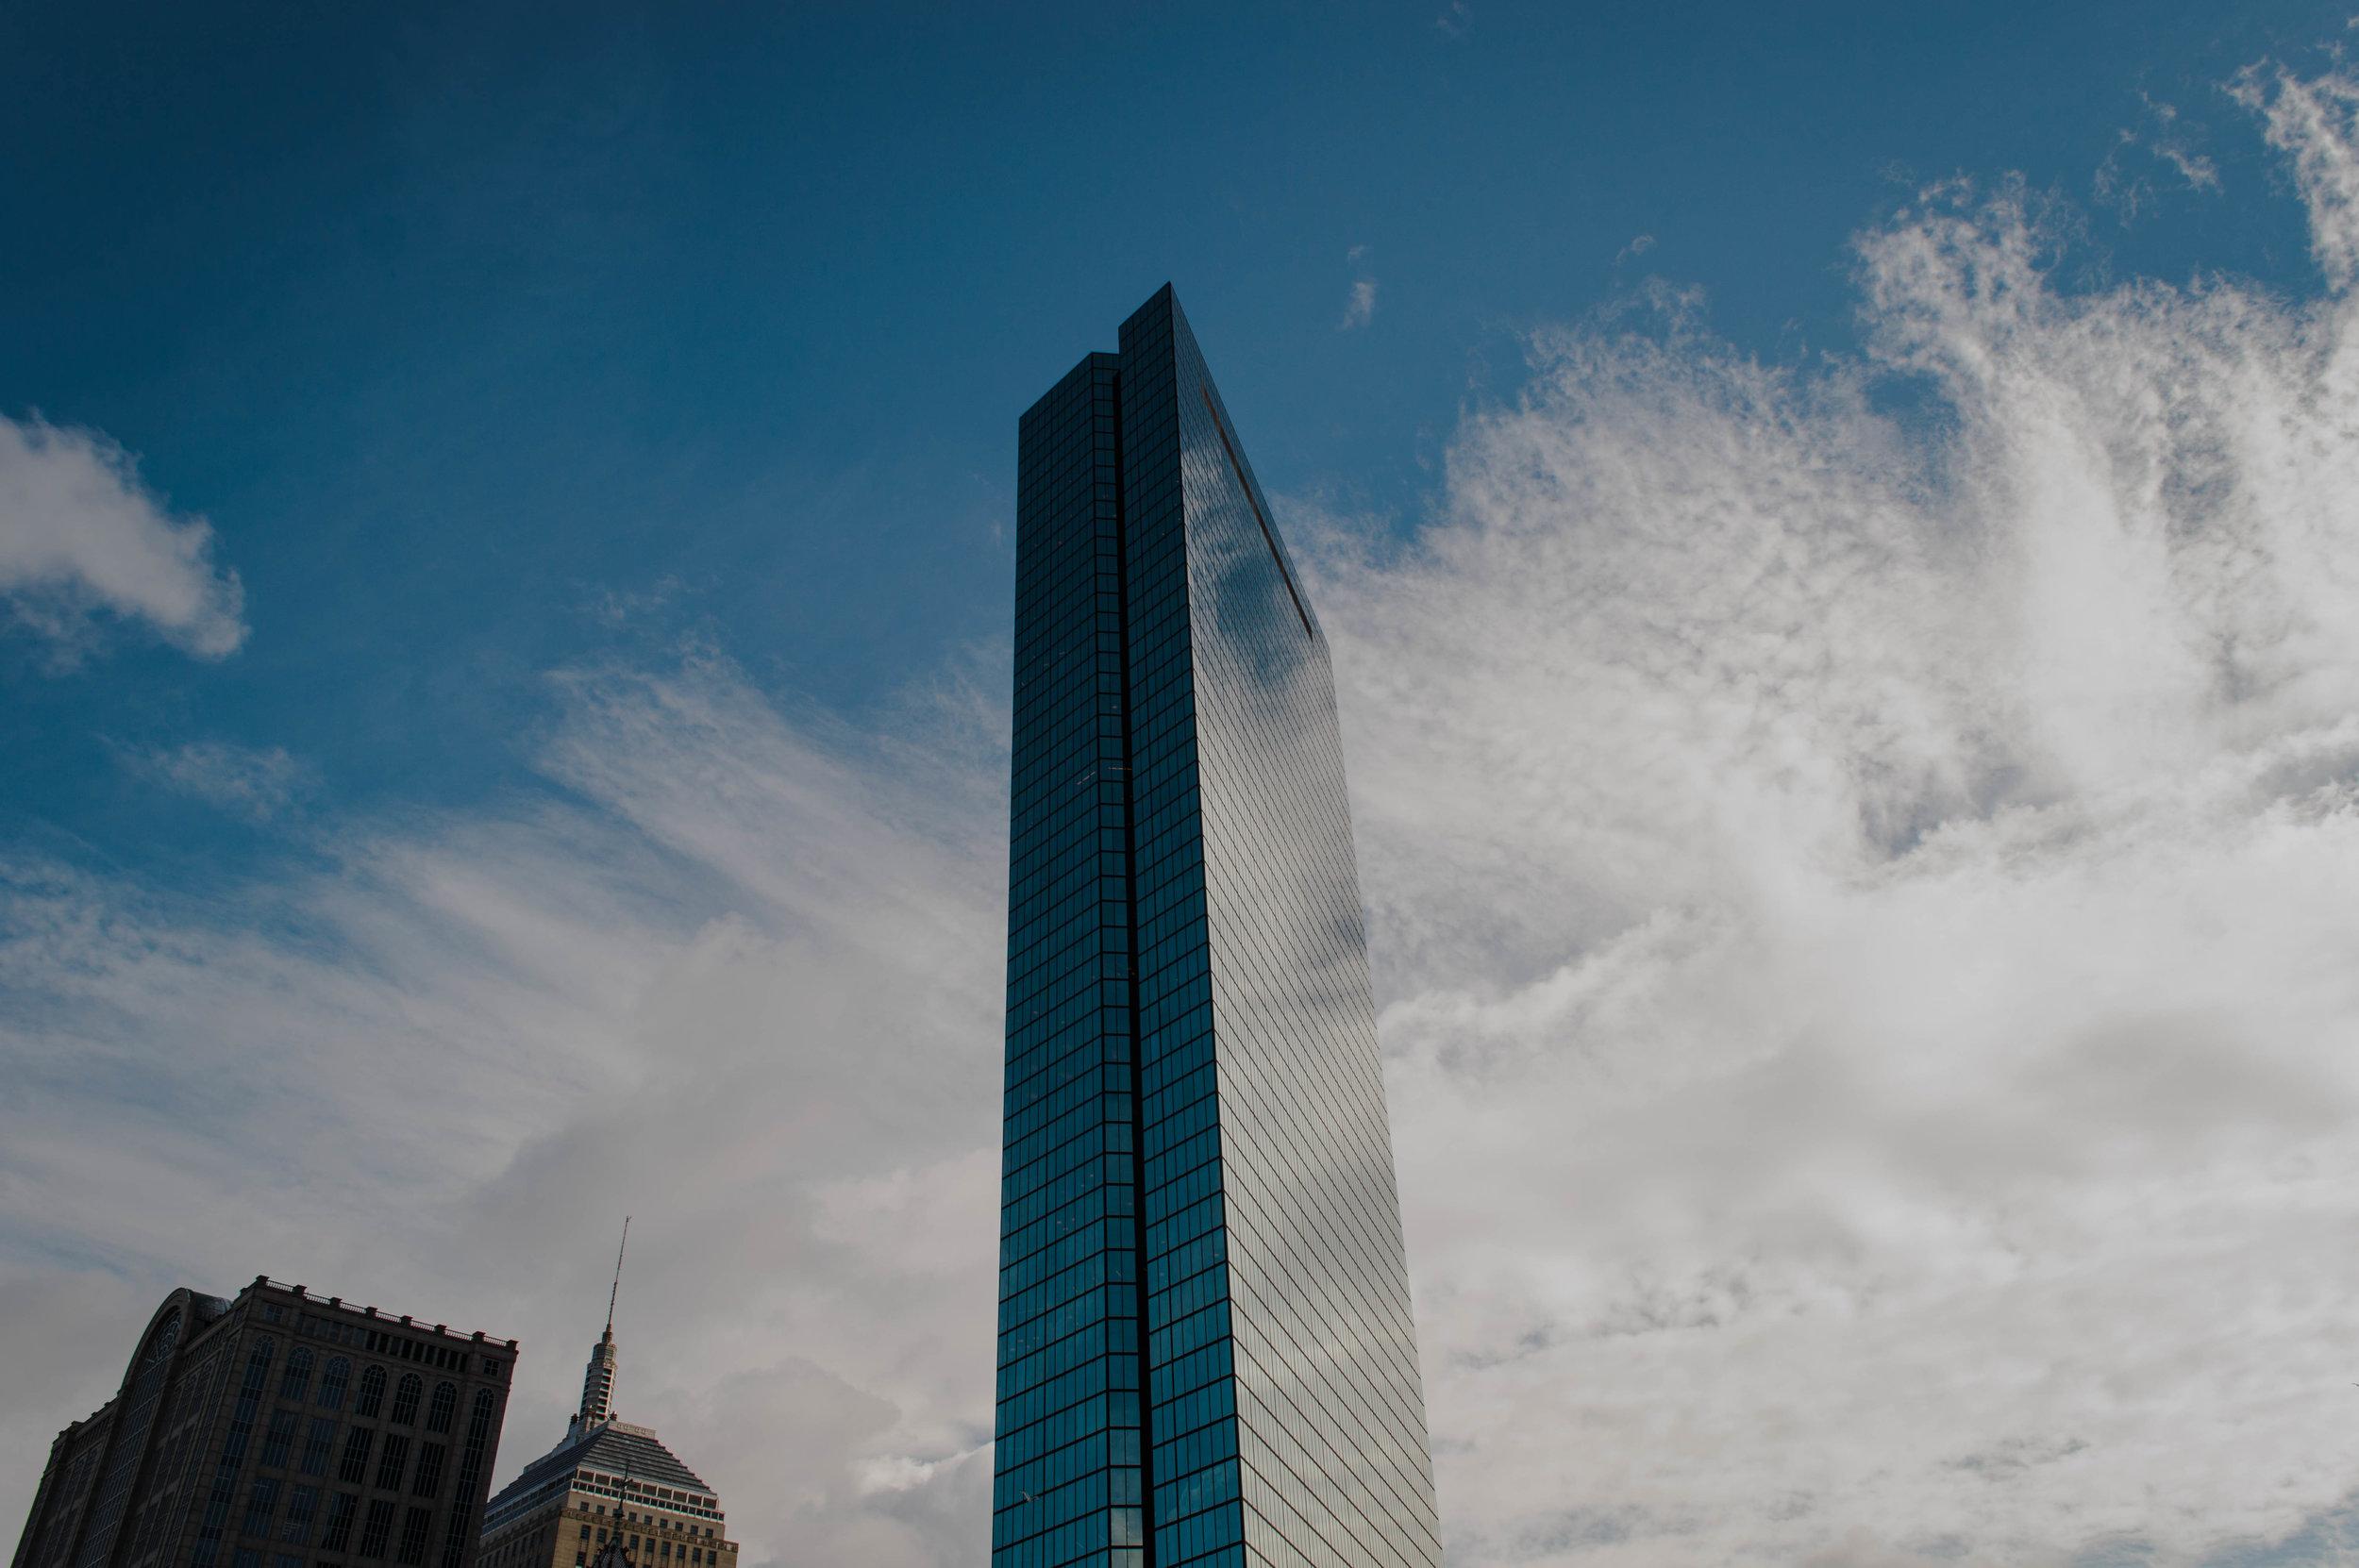 The John Hancock Tower in Boston